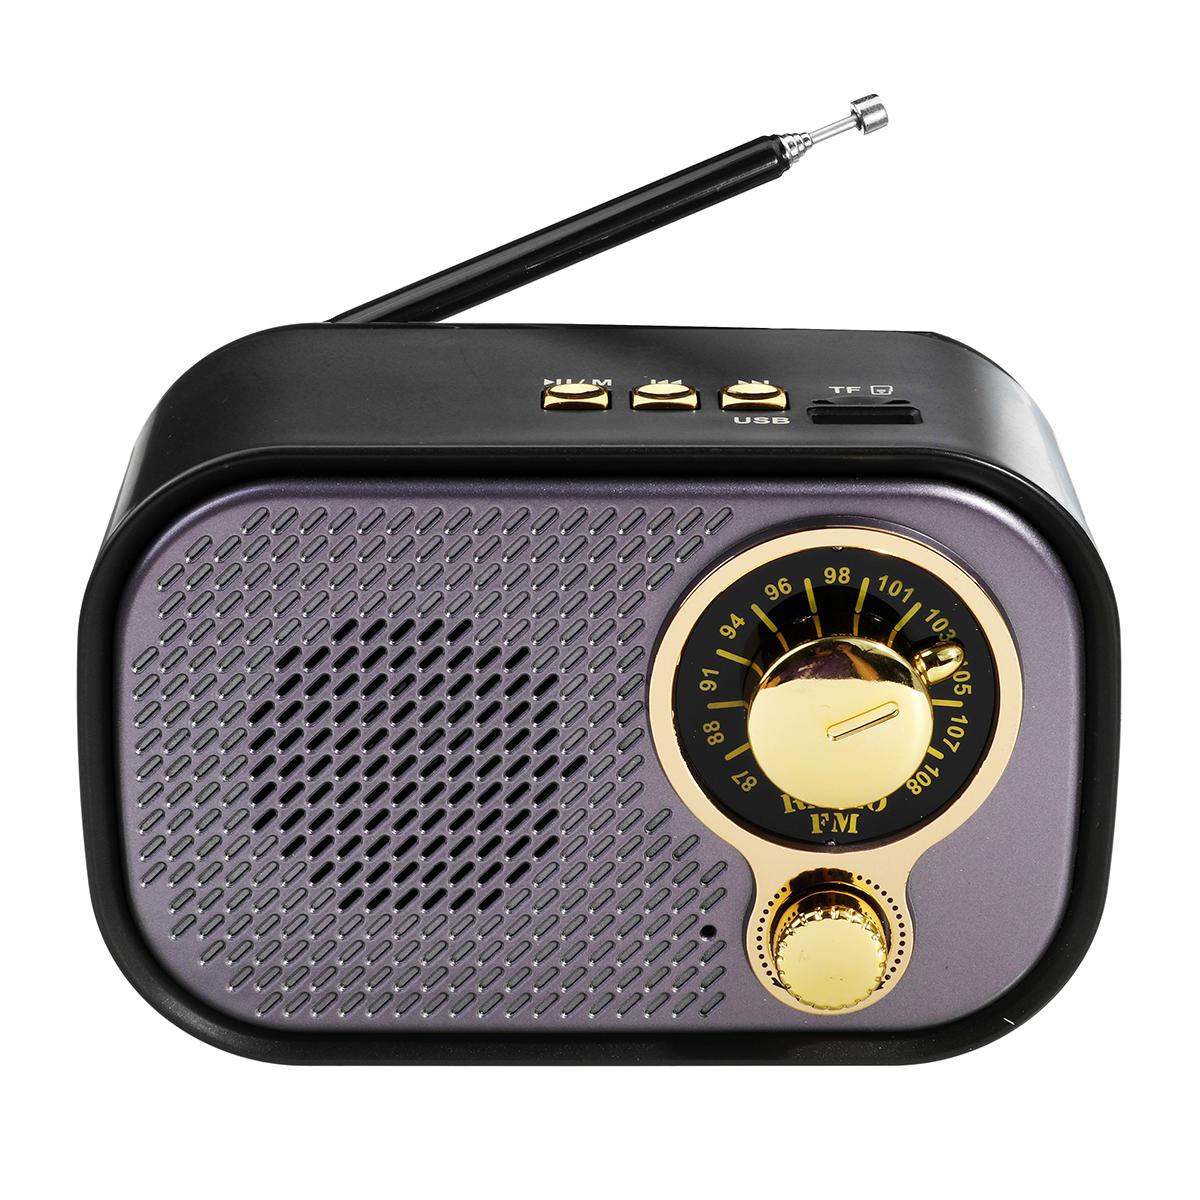 M-209BT DC 5V 5W FM Radio bluetooth AUX Speaker USB TF Card MP3 Music Player